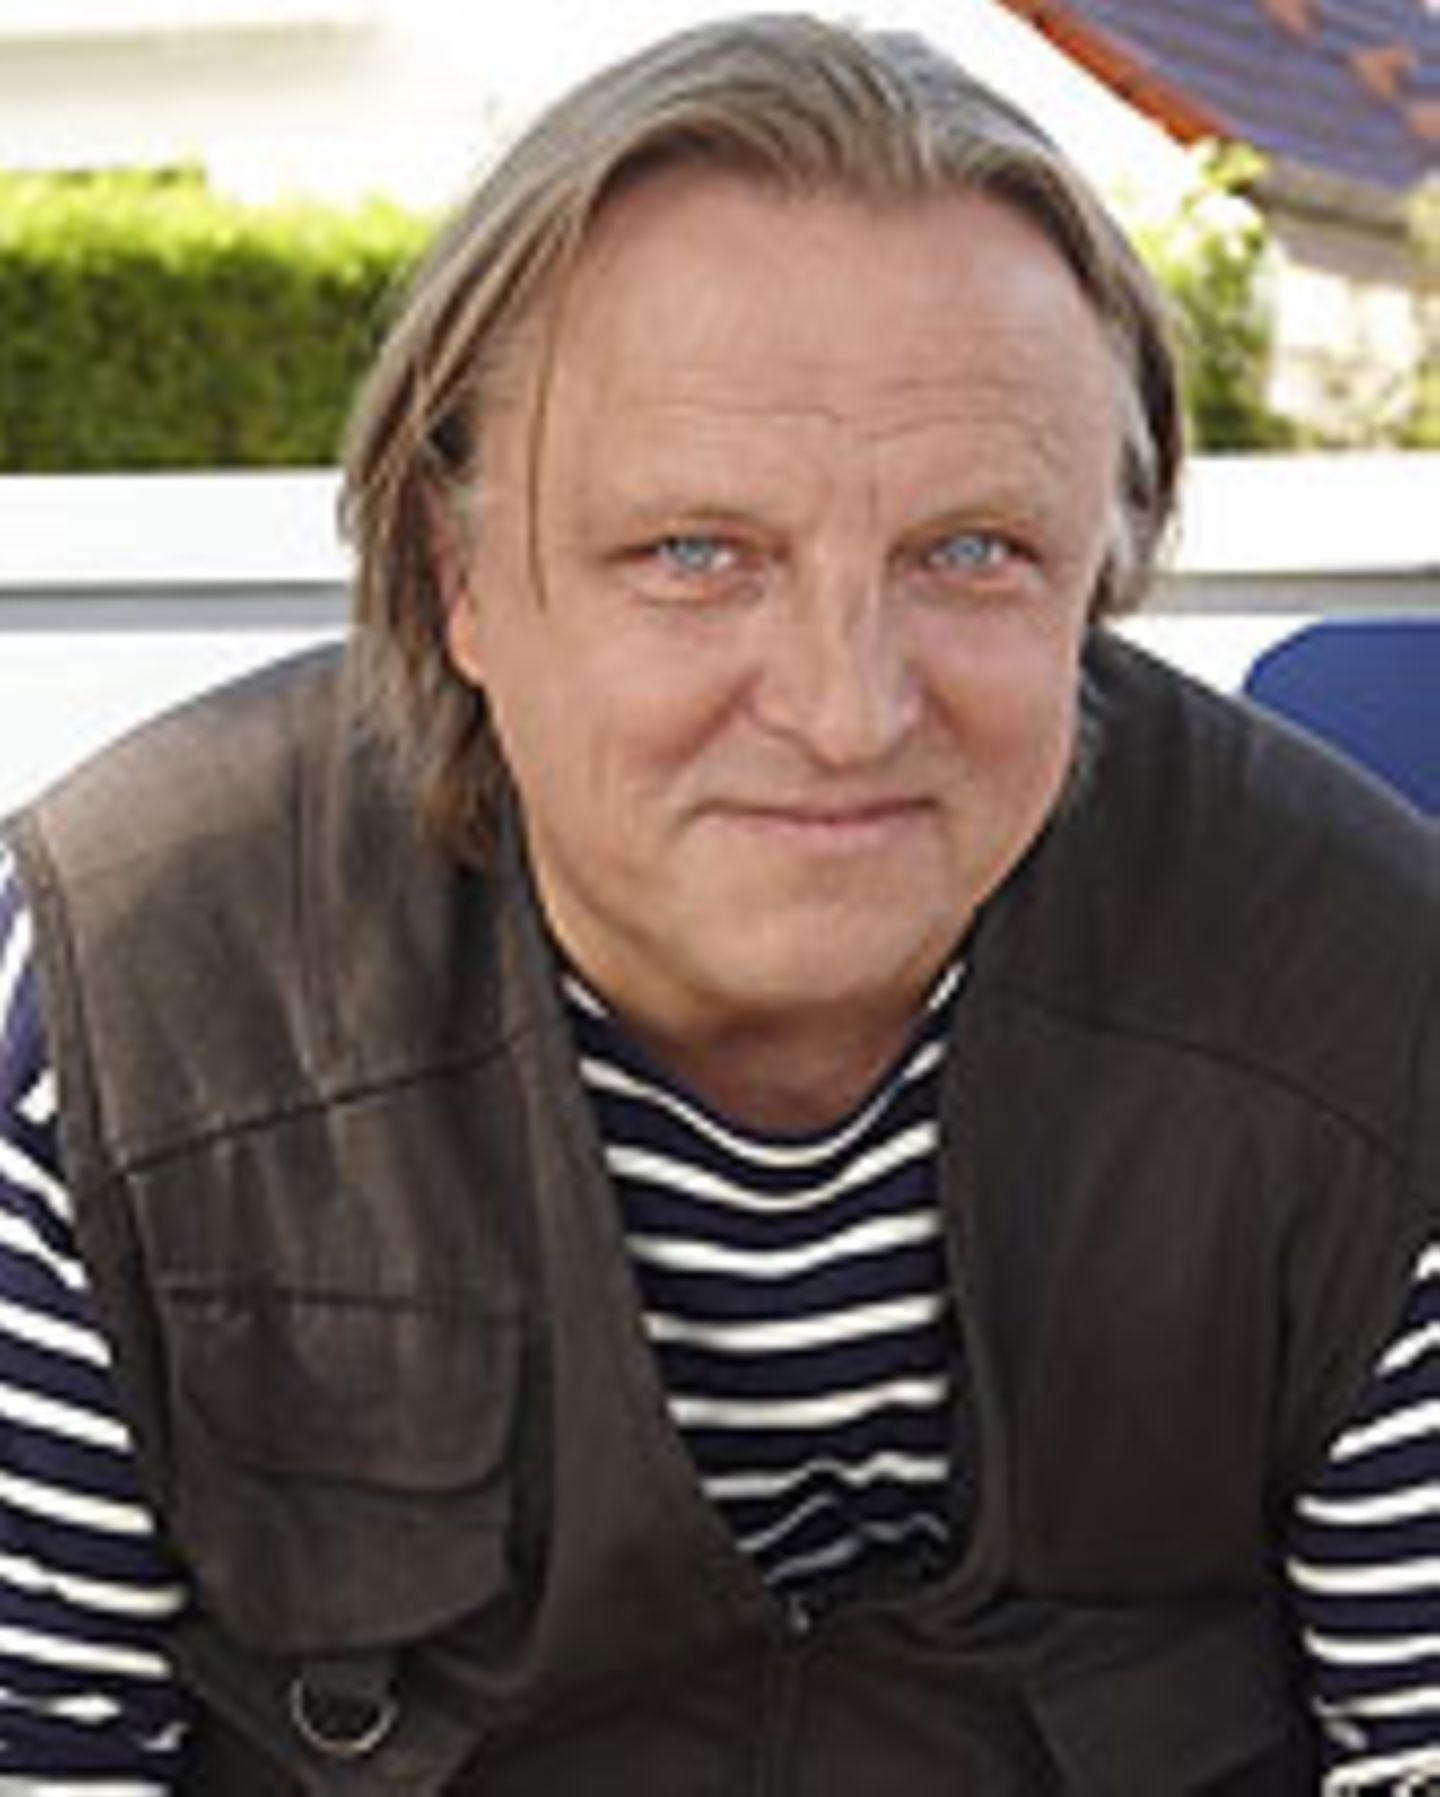 Axel Prahl